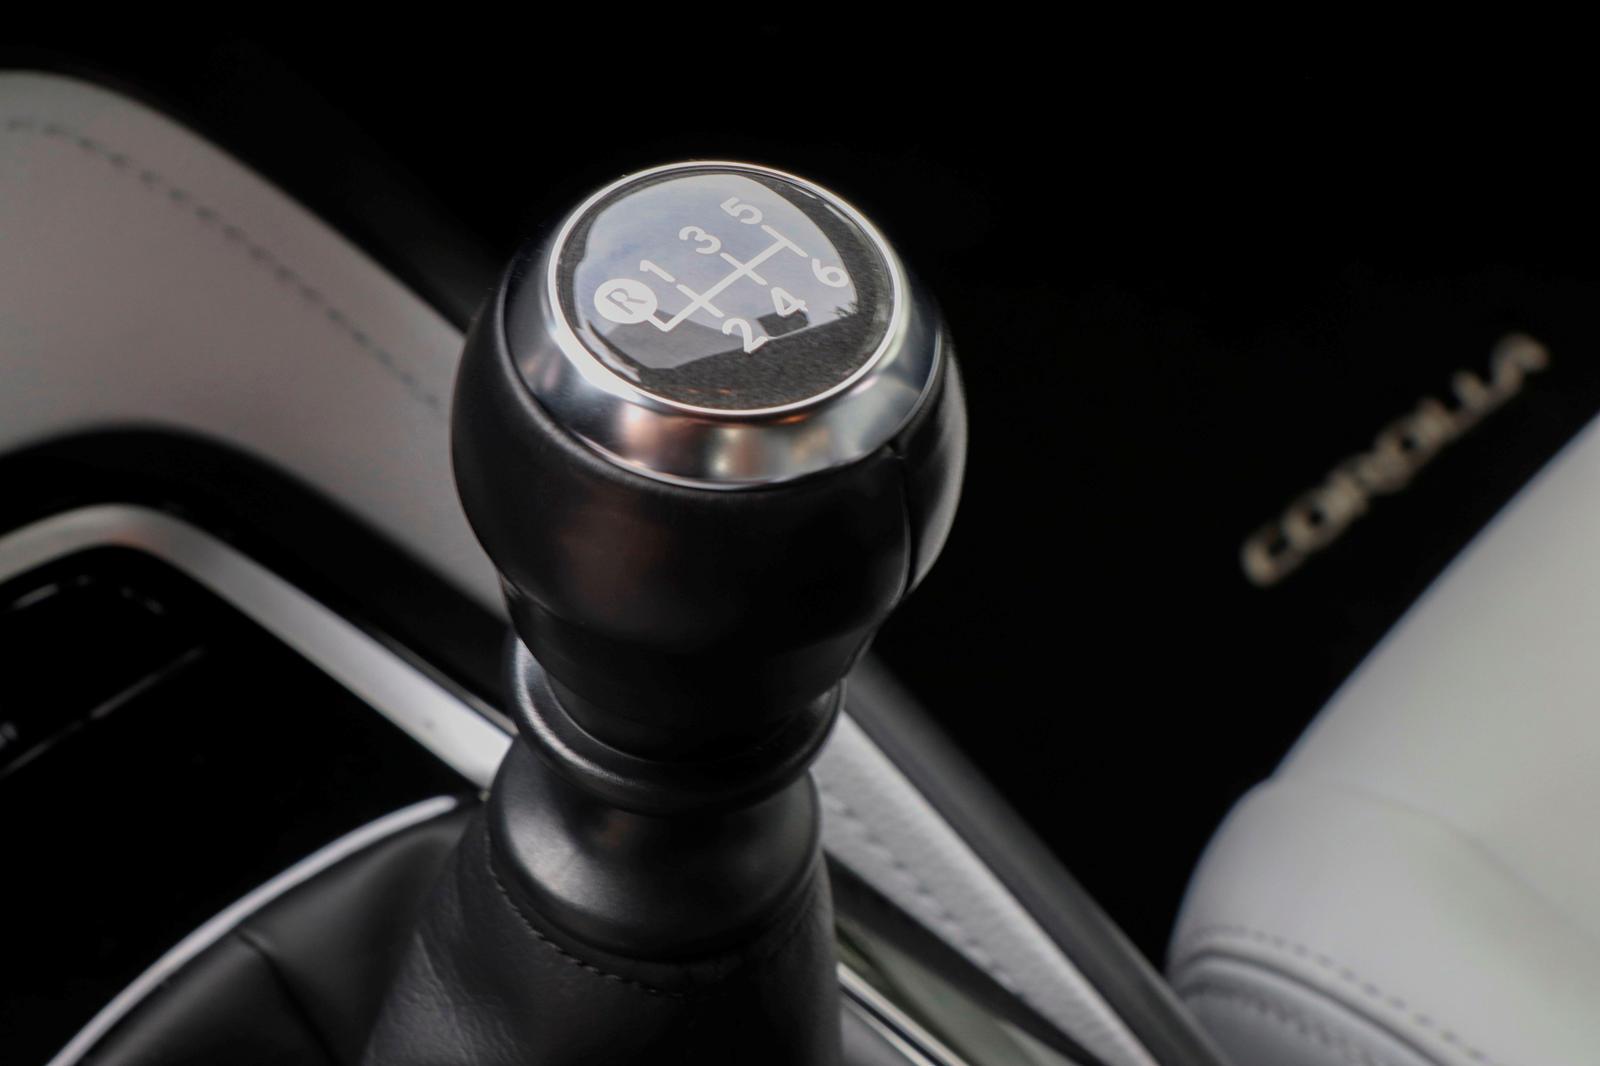 2019-2020 Toyota Corolla Hatchback Test Tahrik Vites Kolu